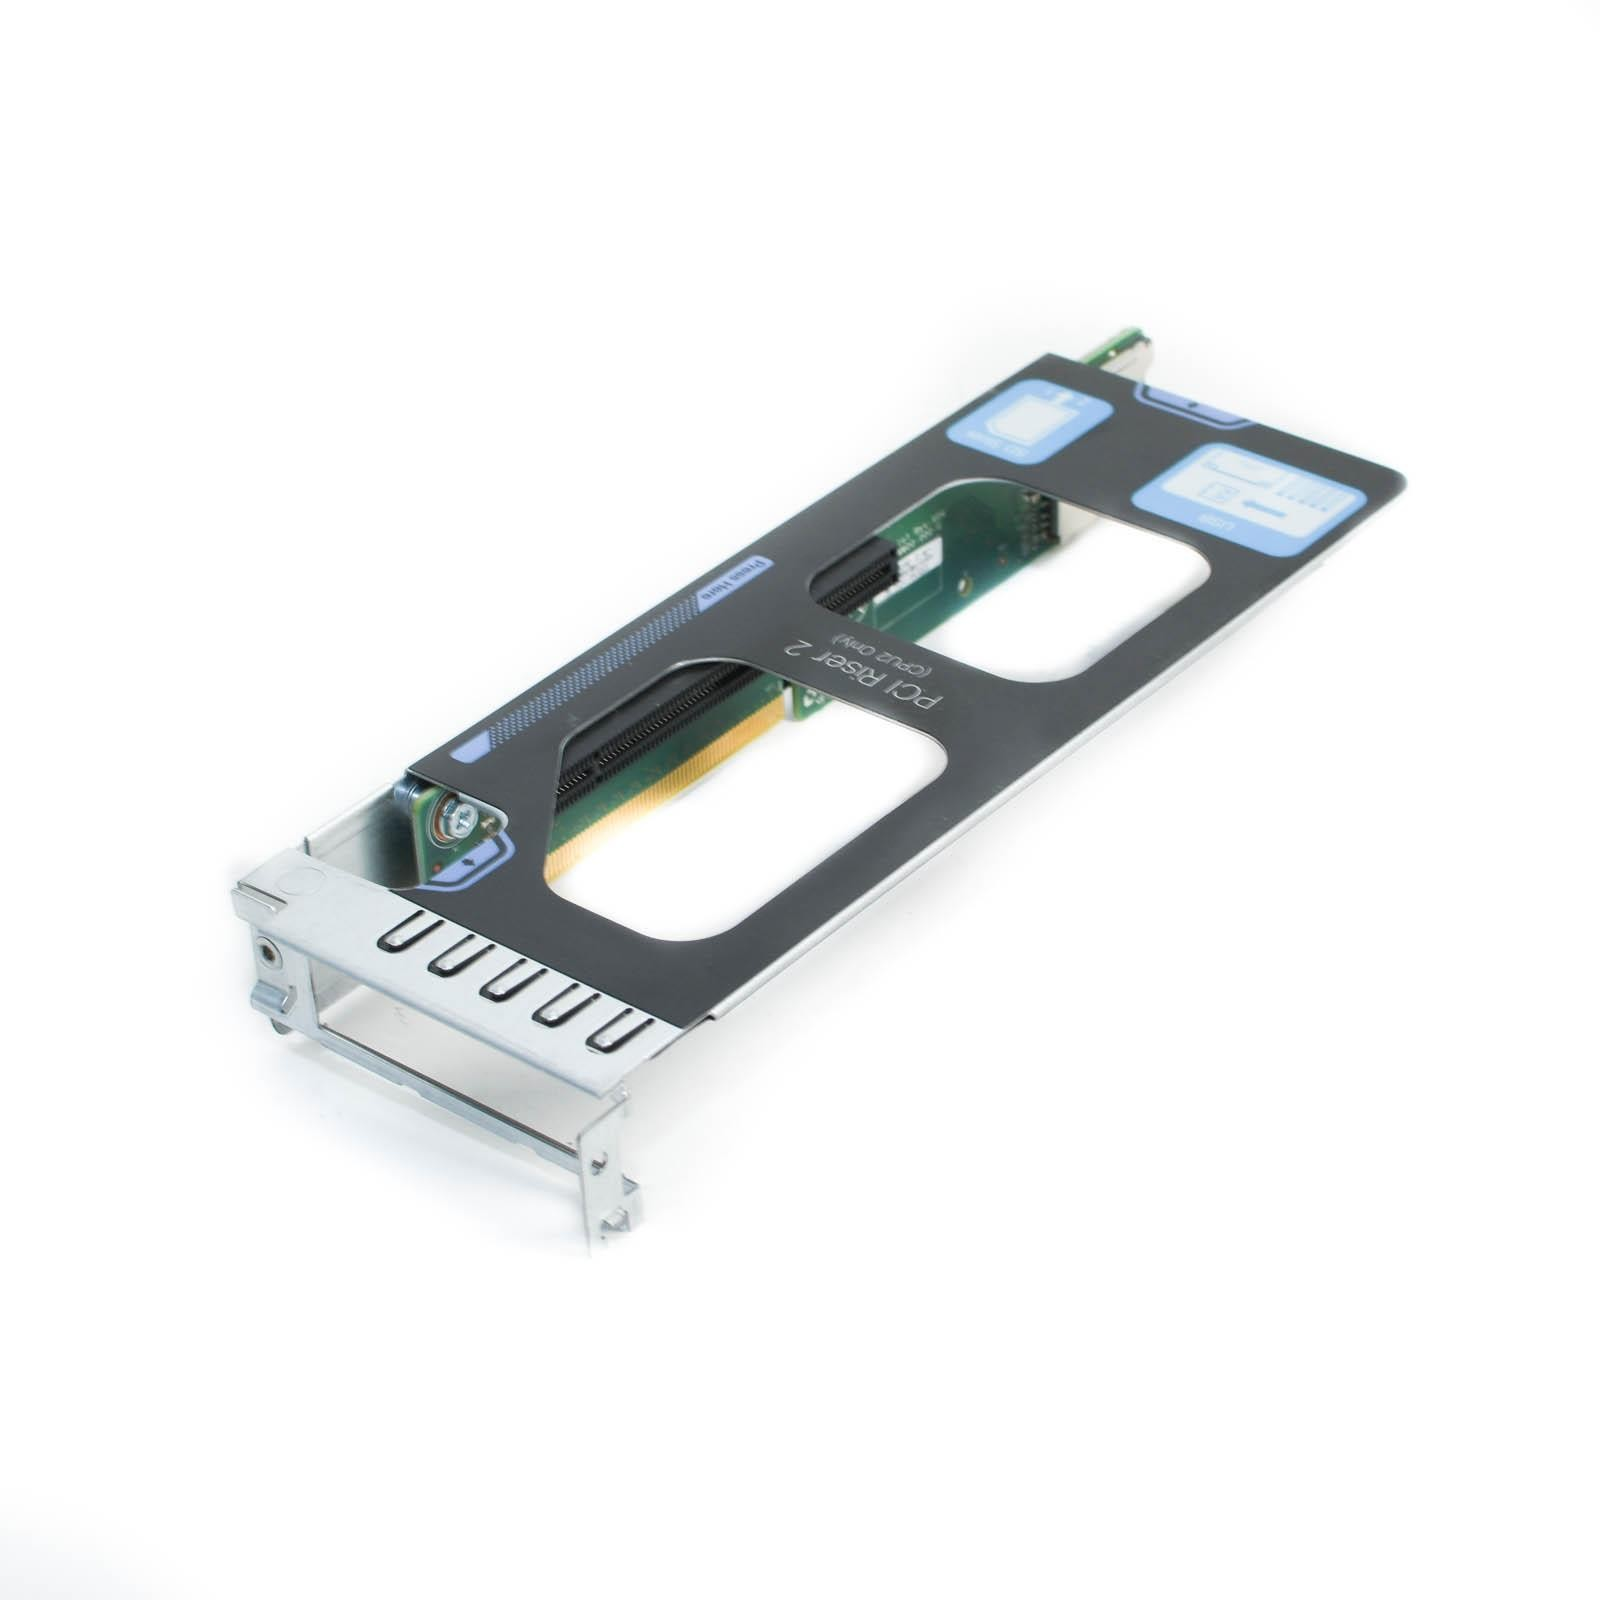 Cisco 74-10151-01 1U PCI-e x16 Riser 2 for UCS C220 M3